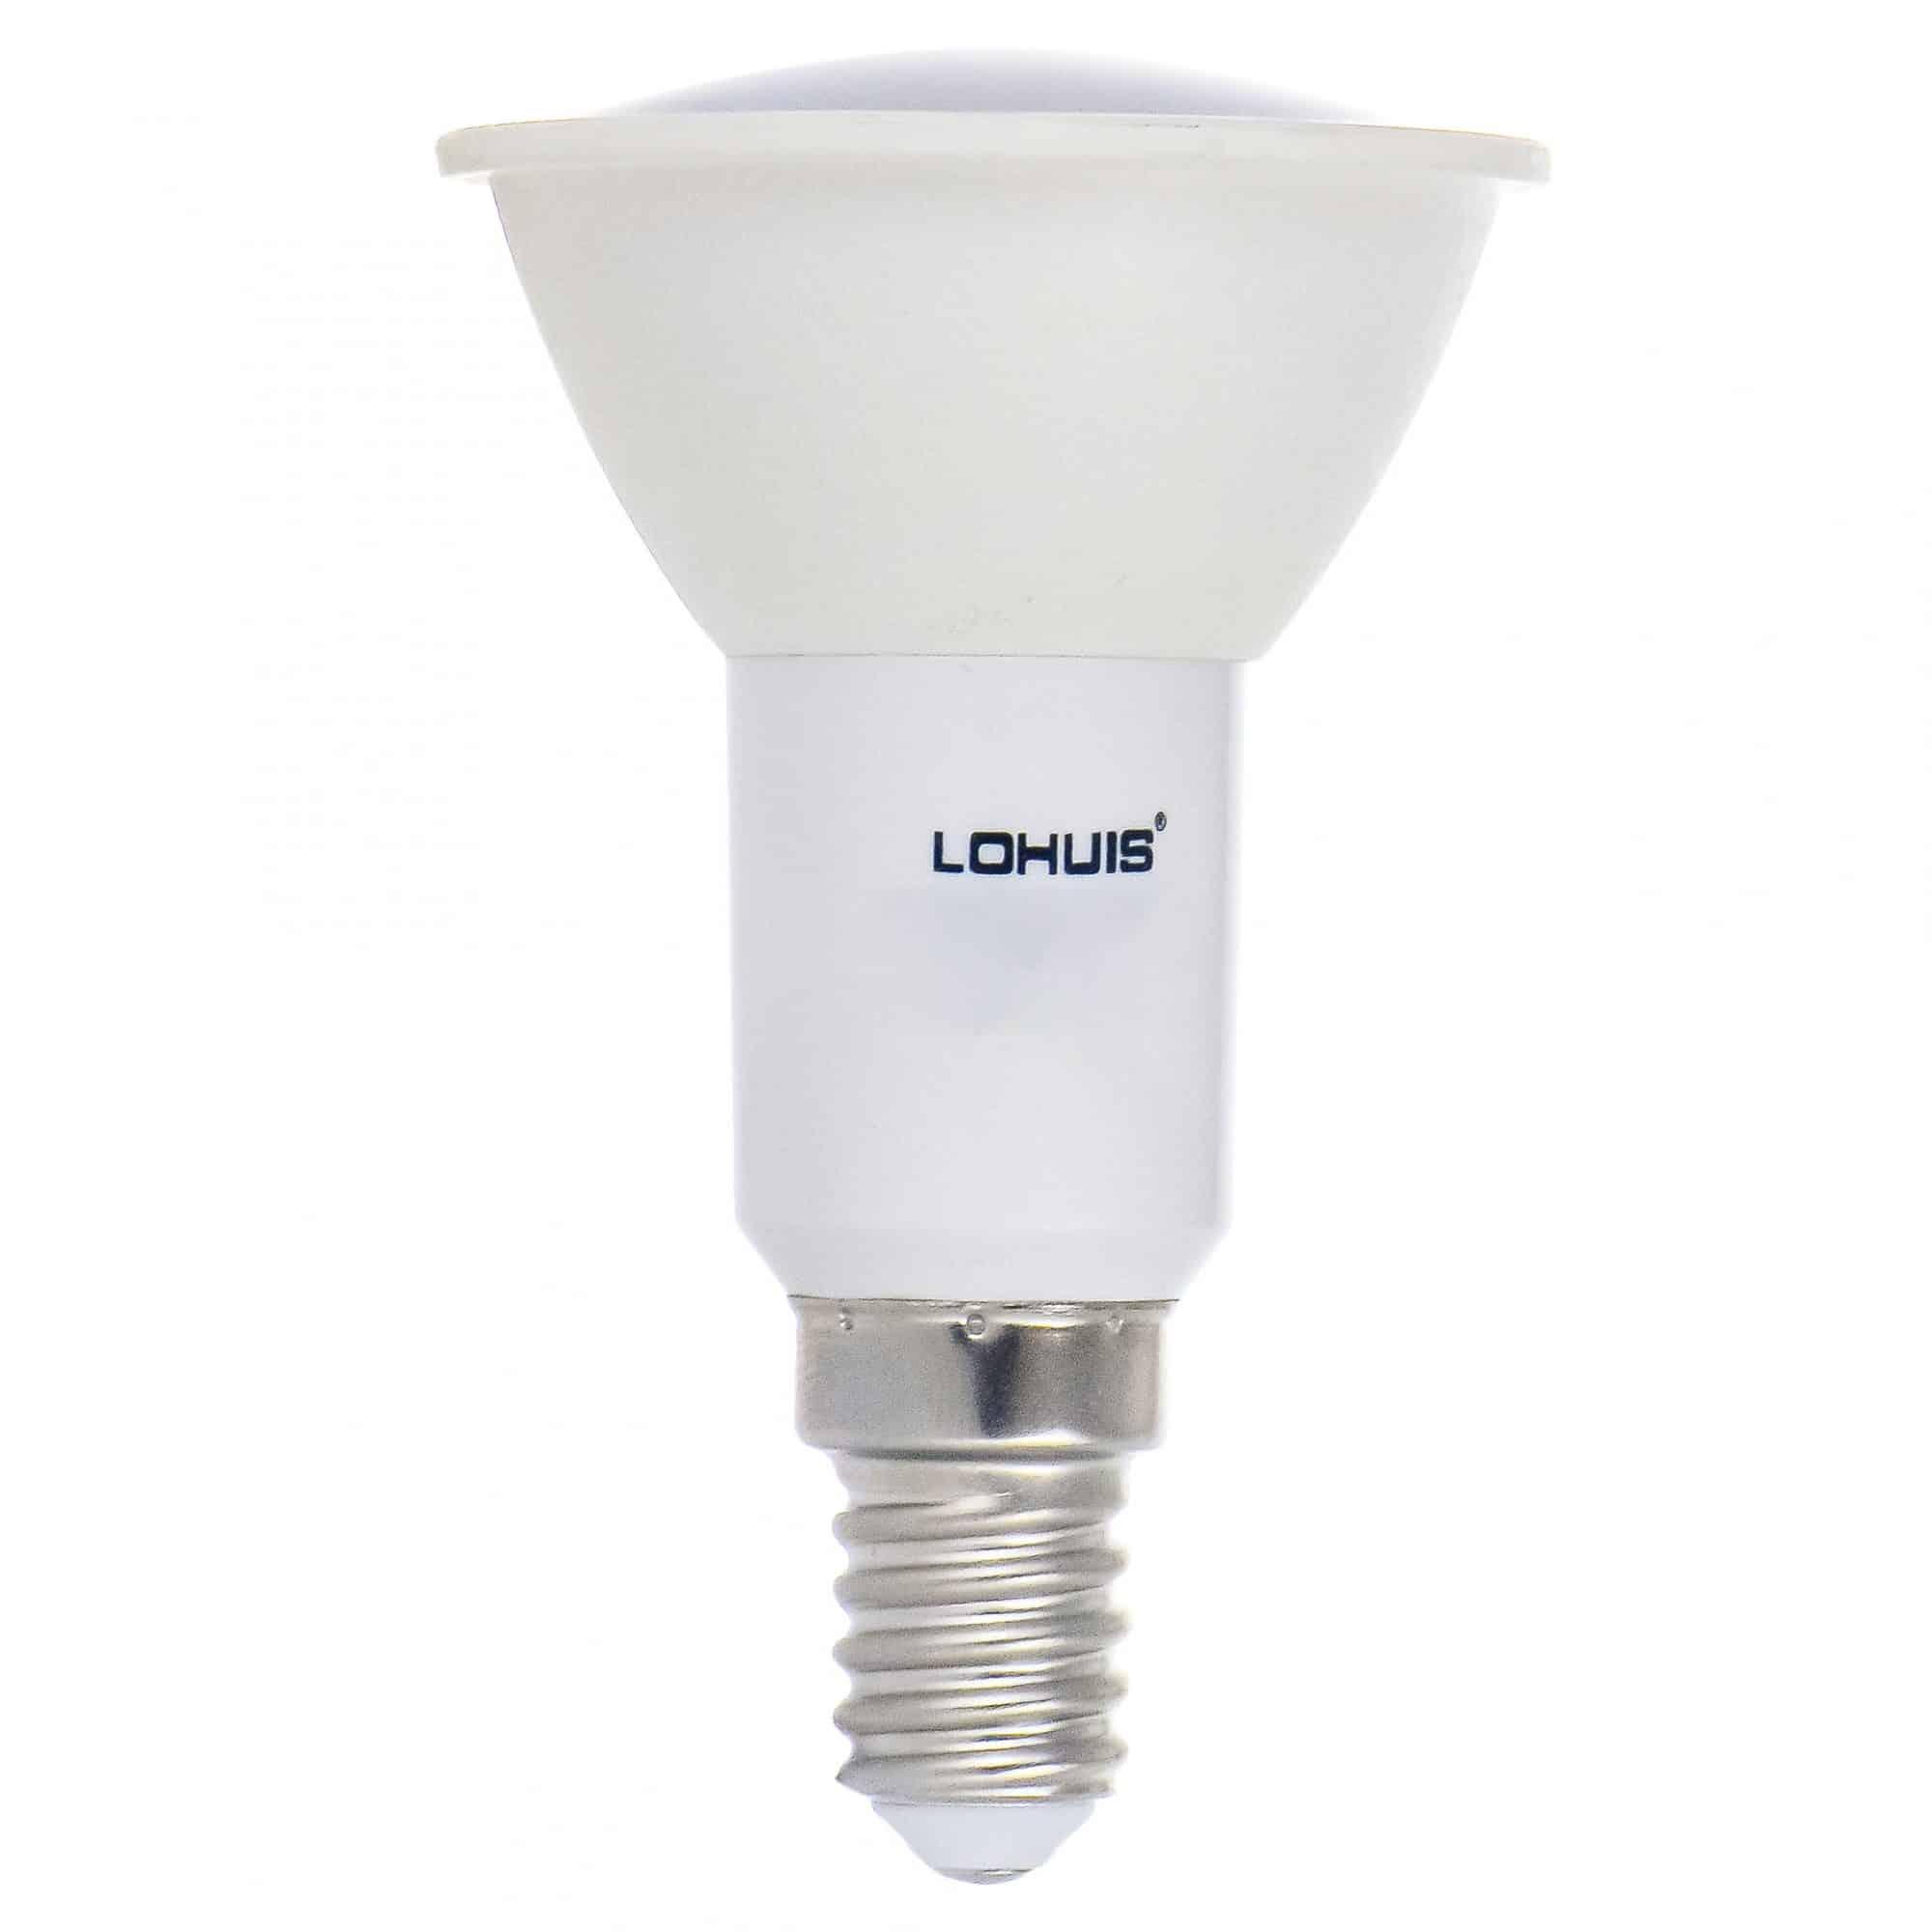 Bec LED Lohuis R50, 6,5W, 500 lm, lumina rece imagine MatHaus.ro